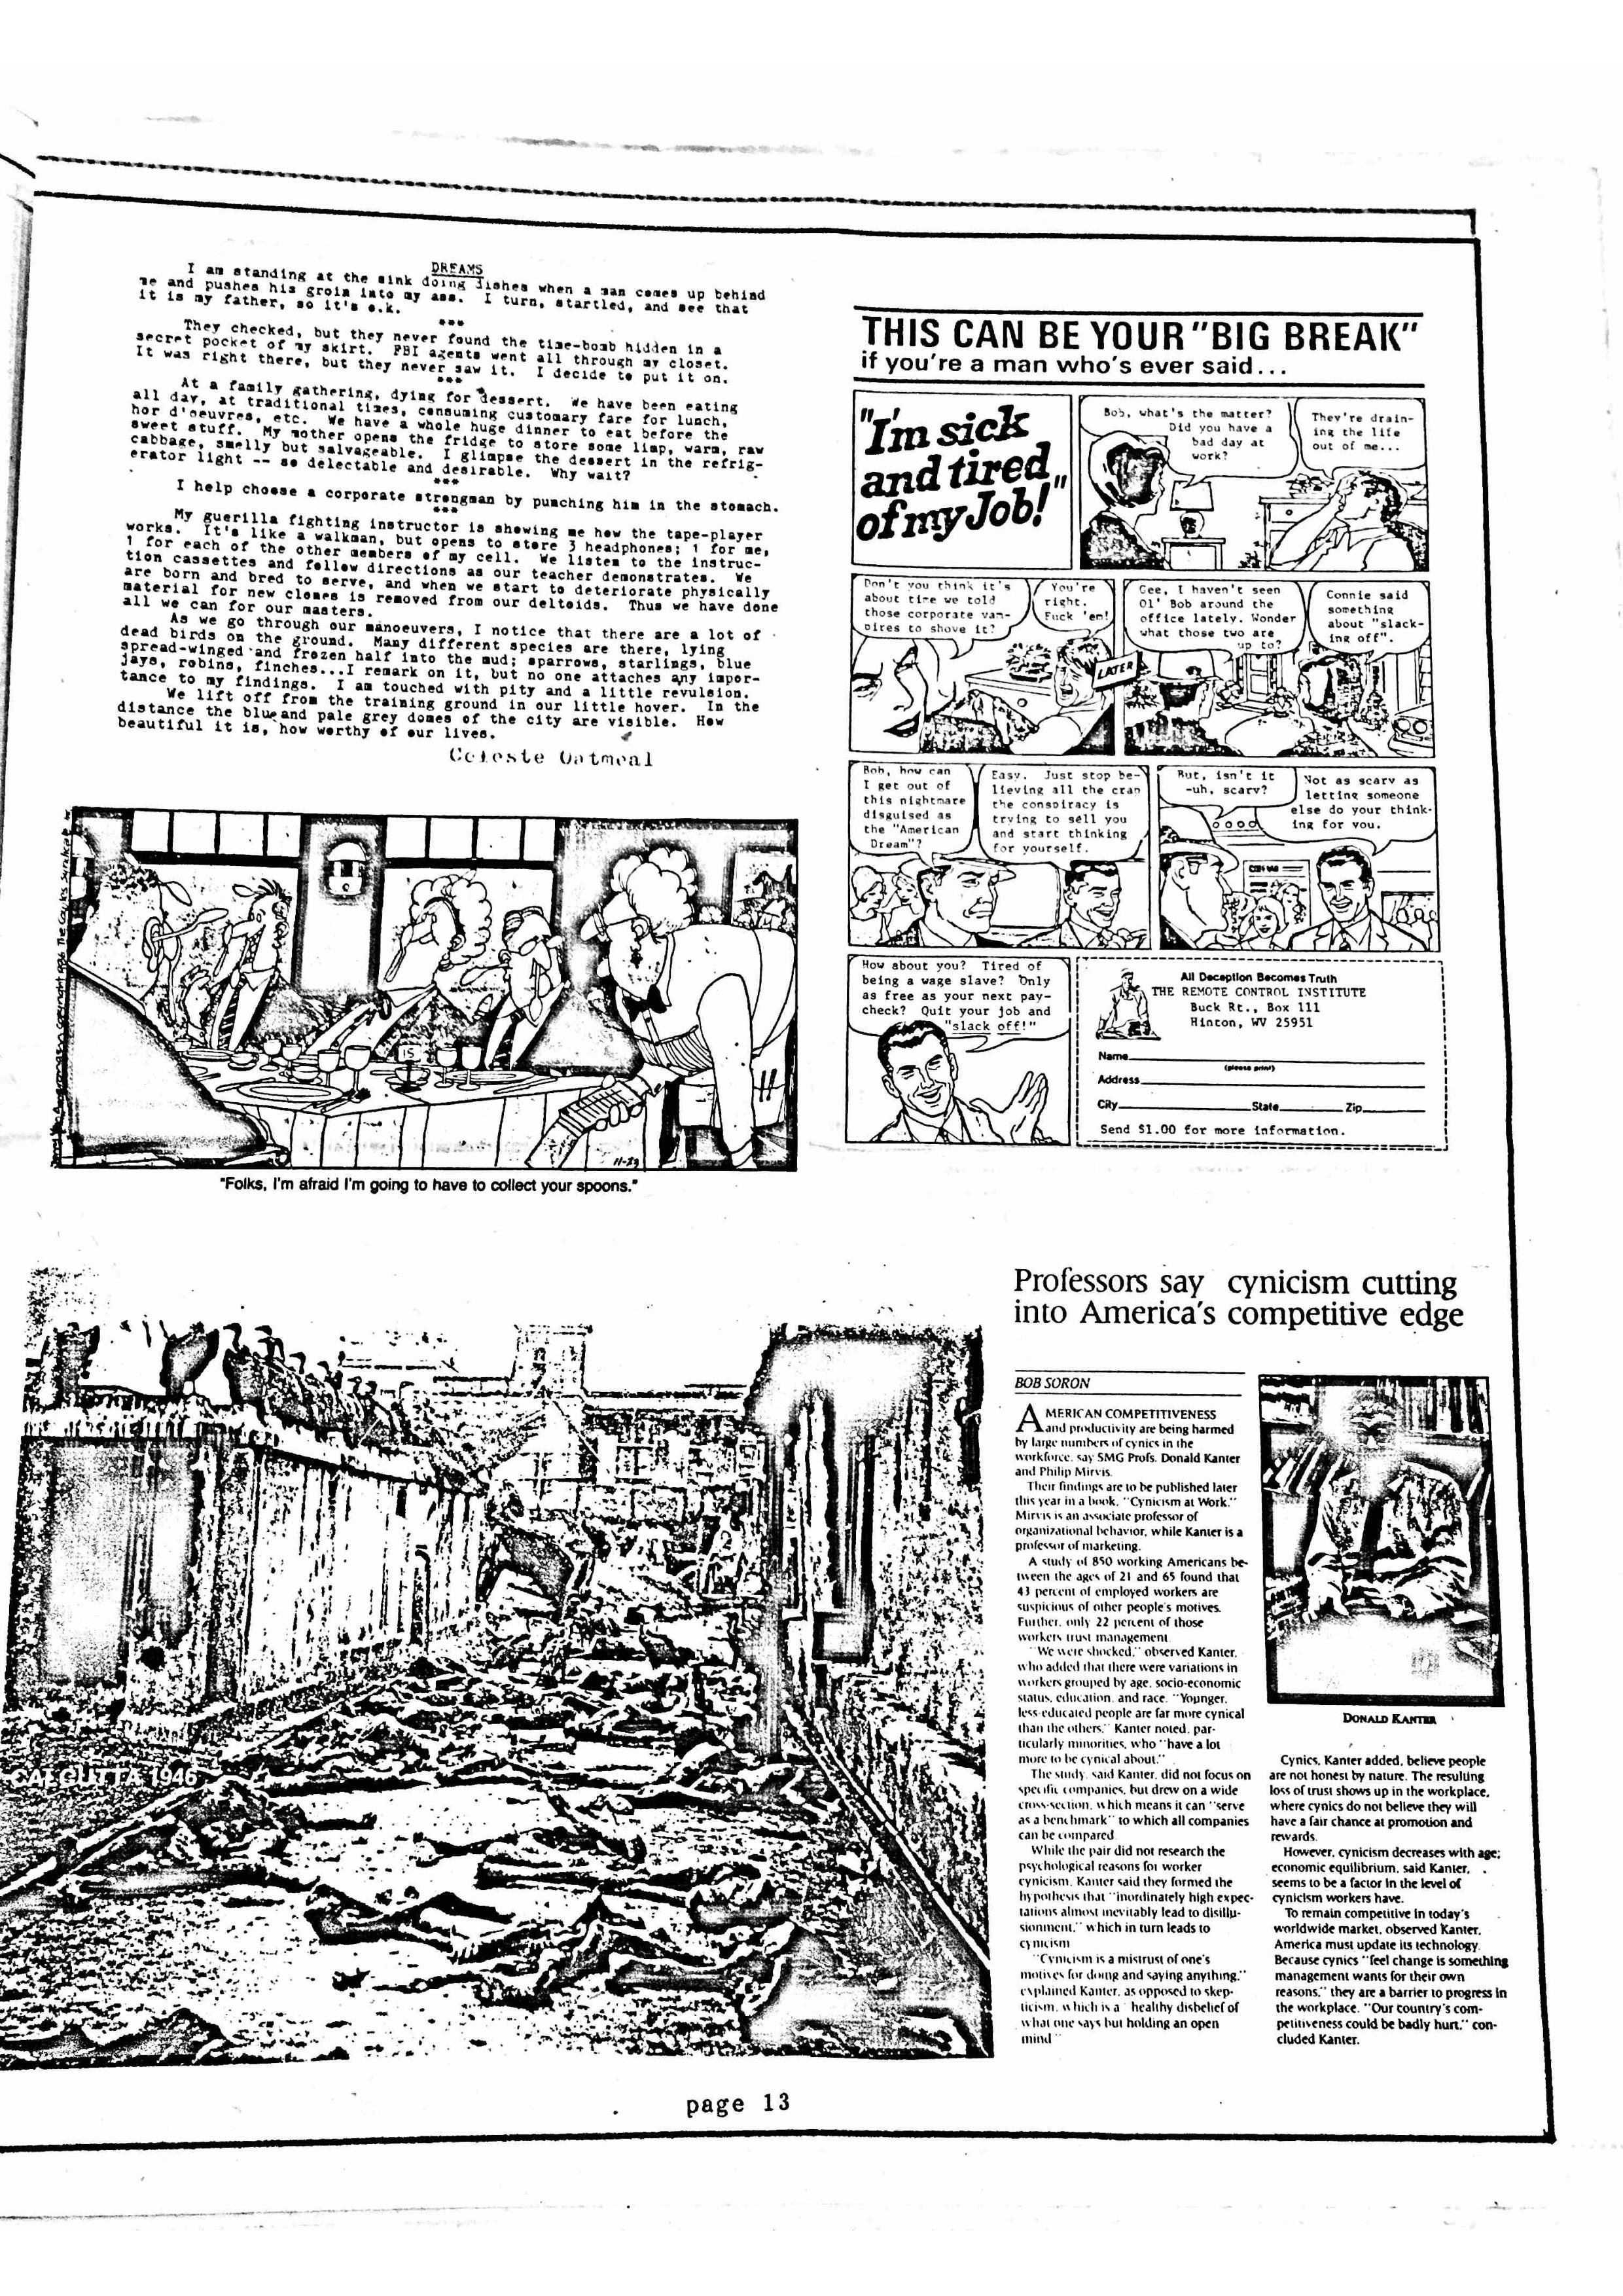 PopRealLast1-page-019.jpg